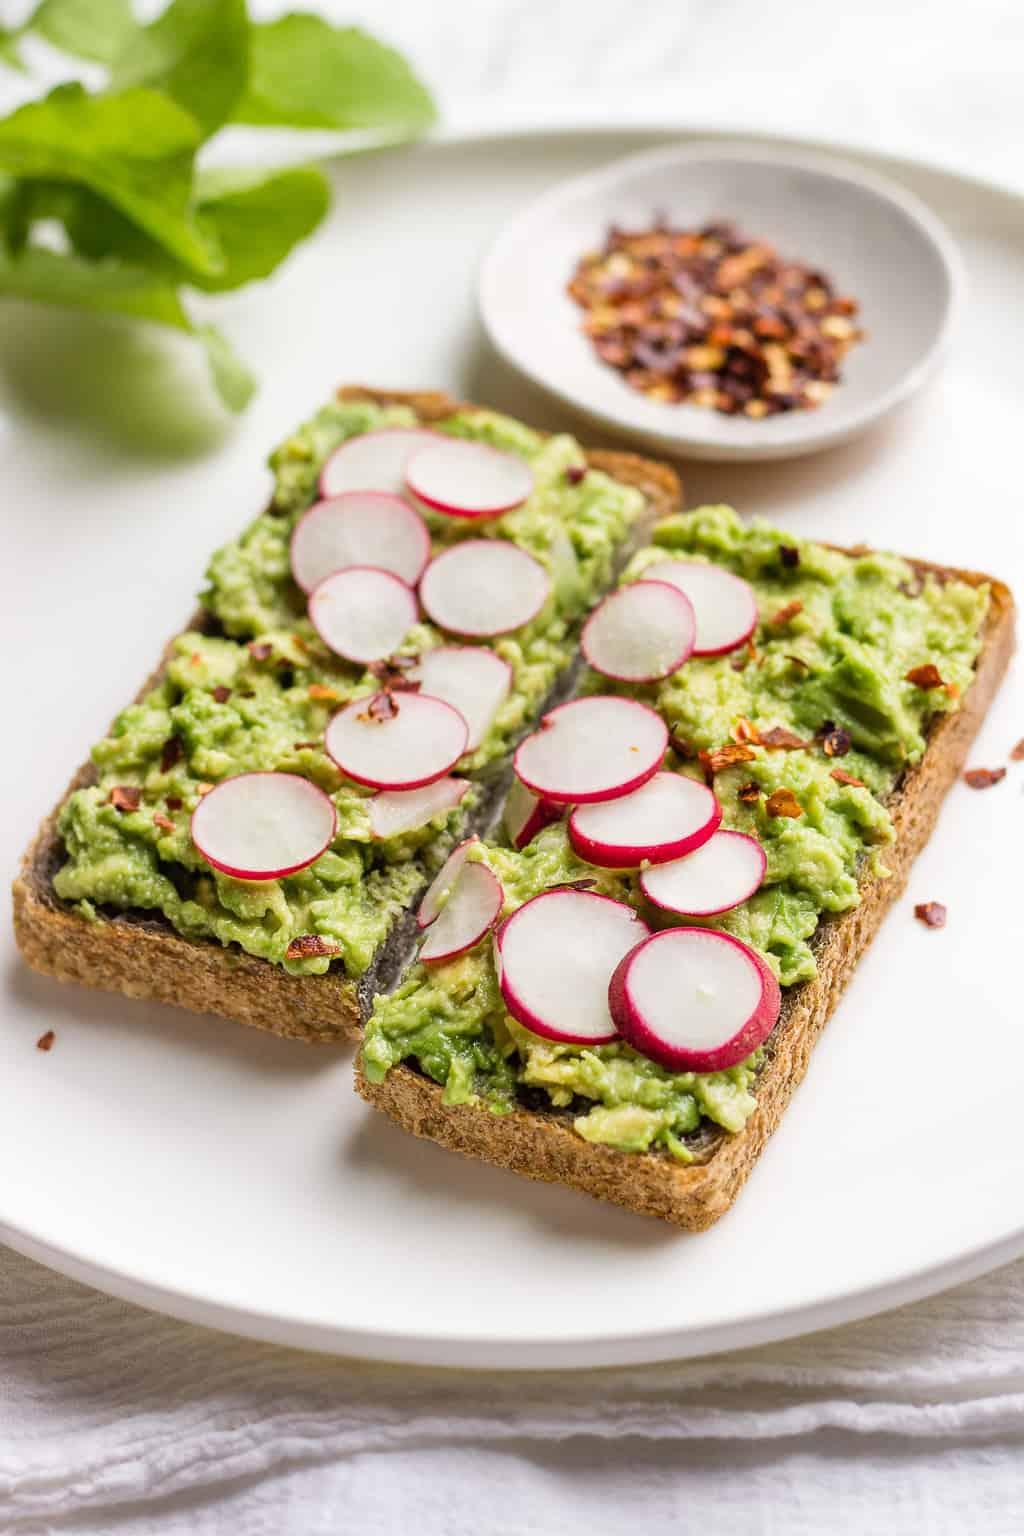 Vegan Avocado Sandwich on a plate